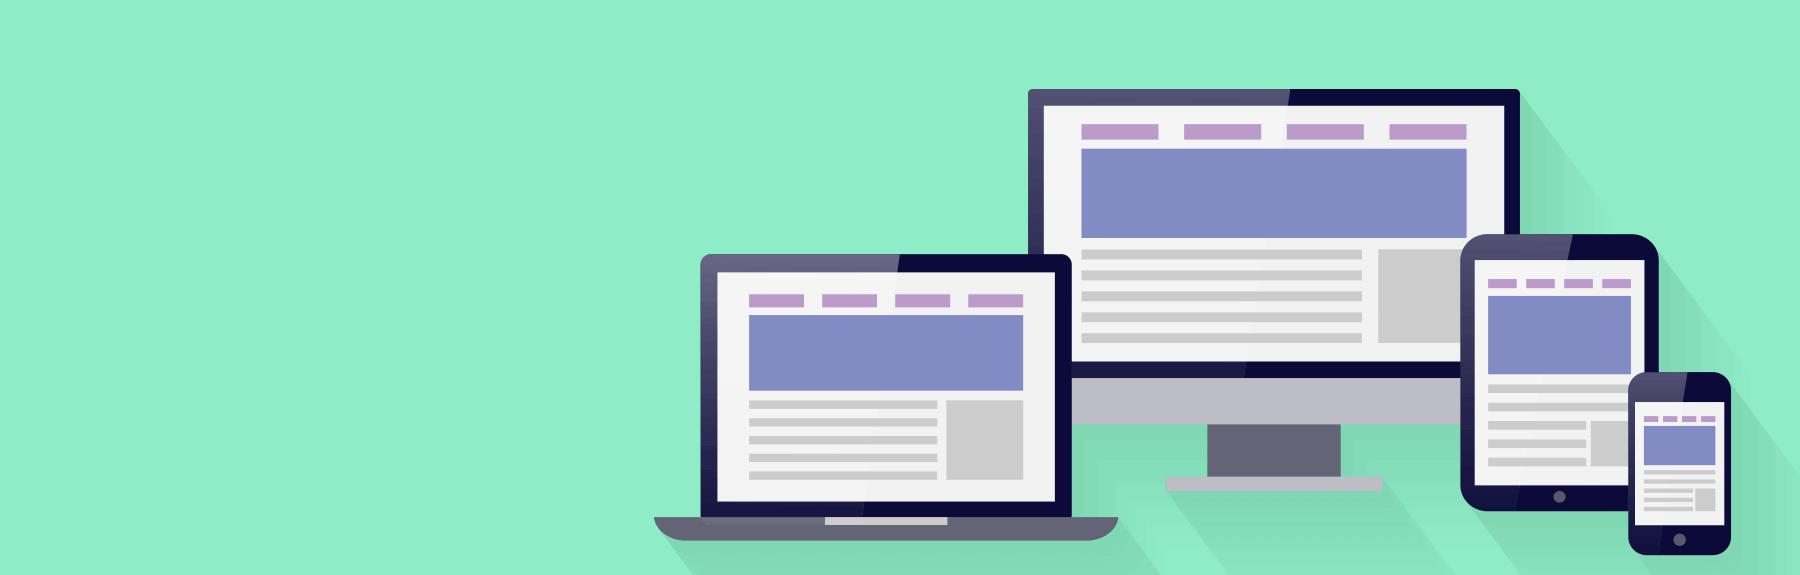 ui-design-responsive-web-design-trends-header